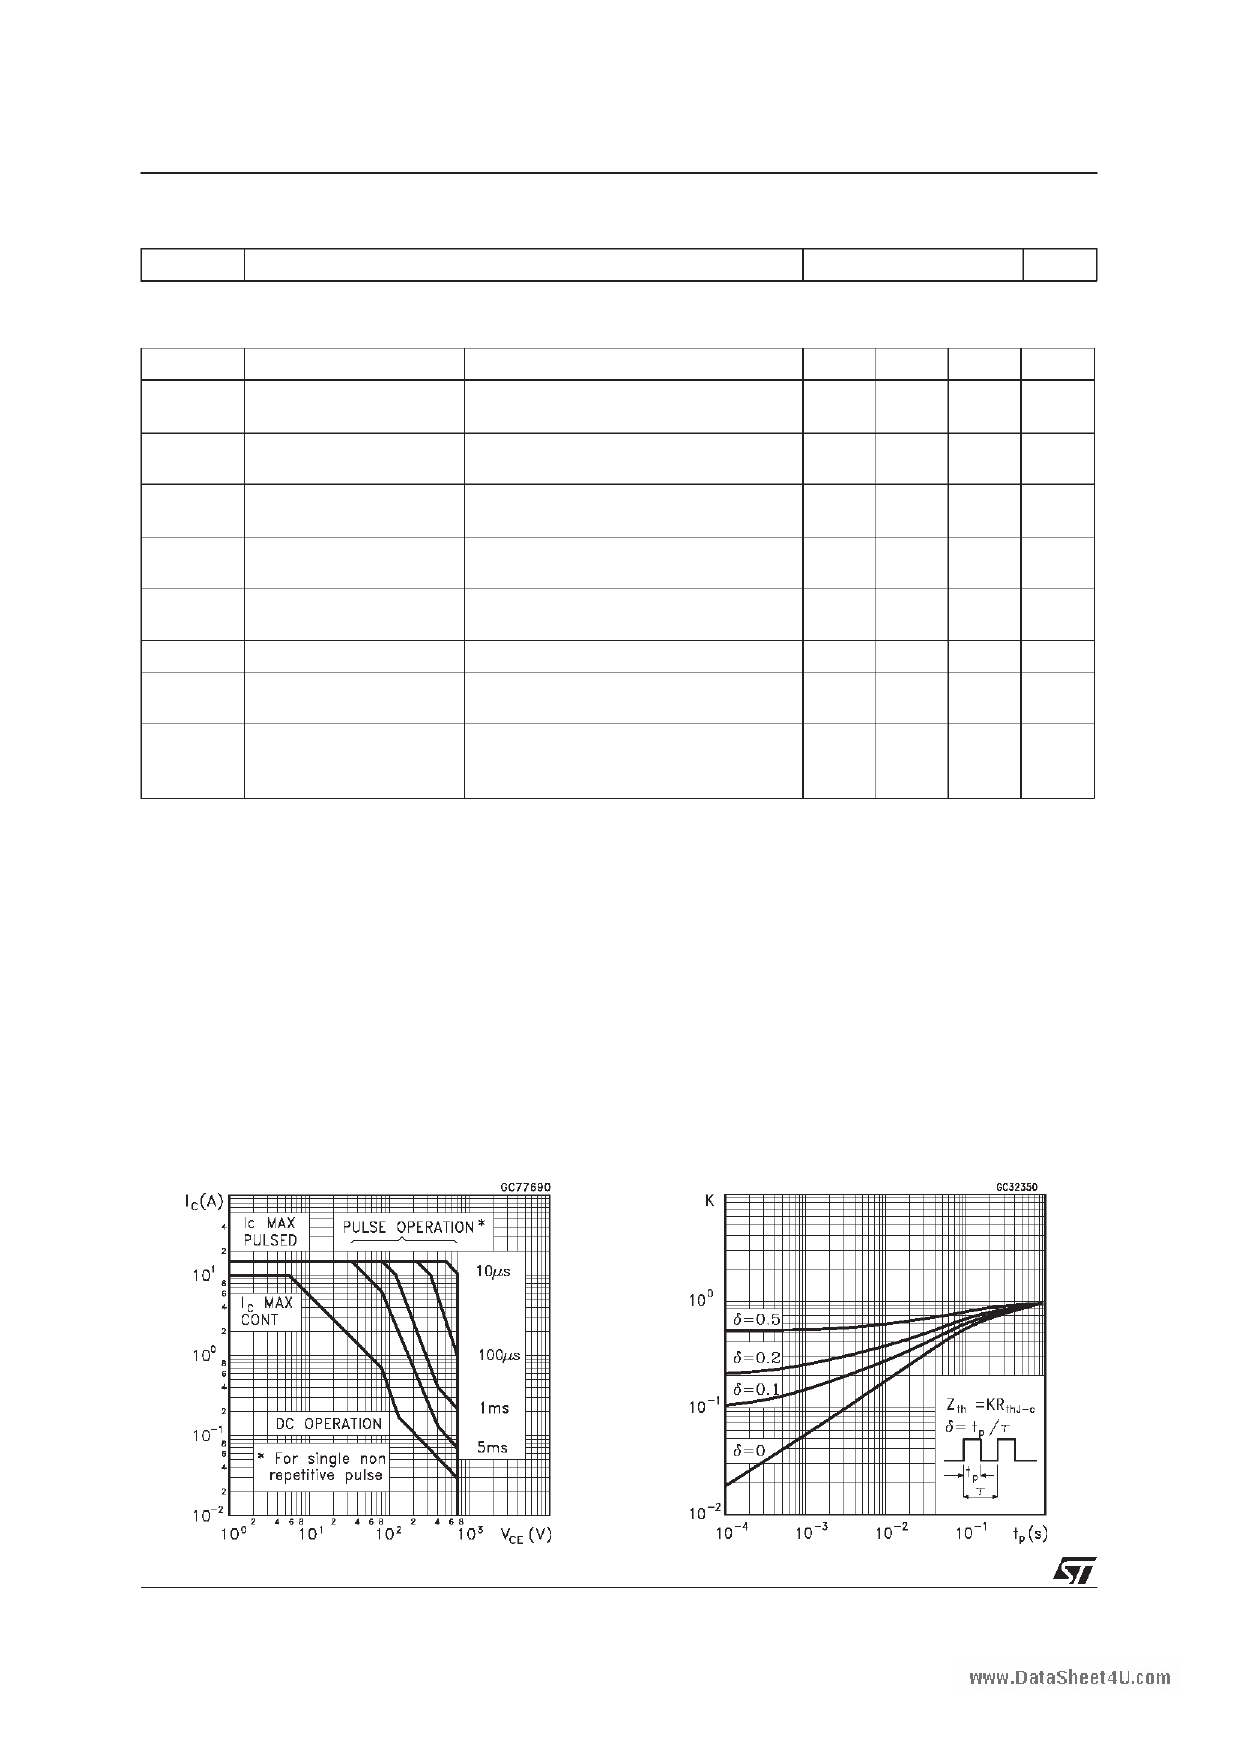 1803DHI pdf schematic